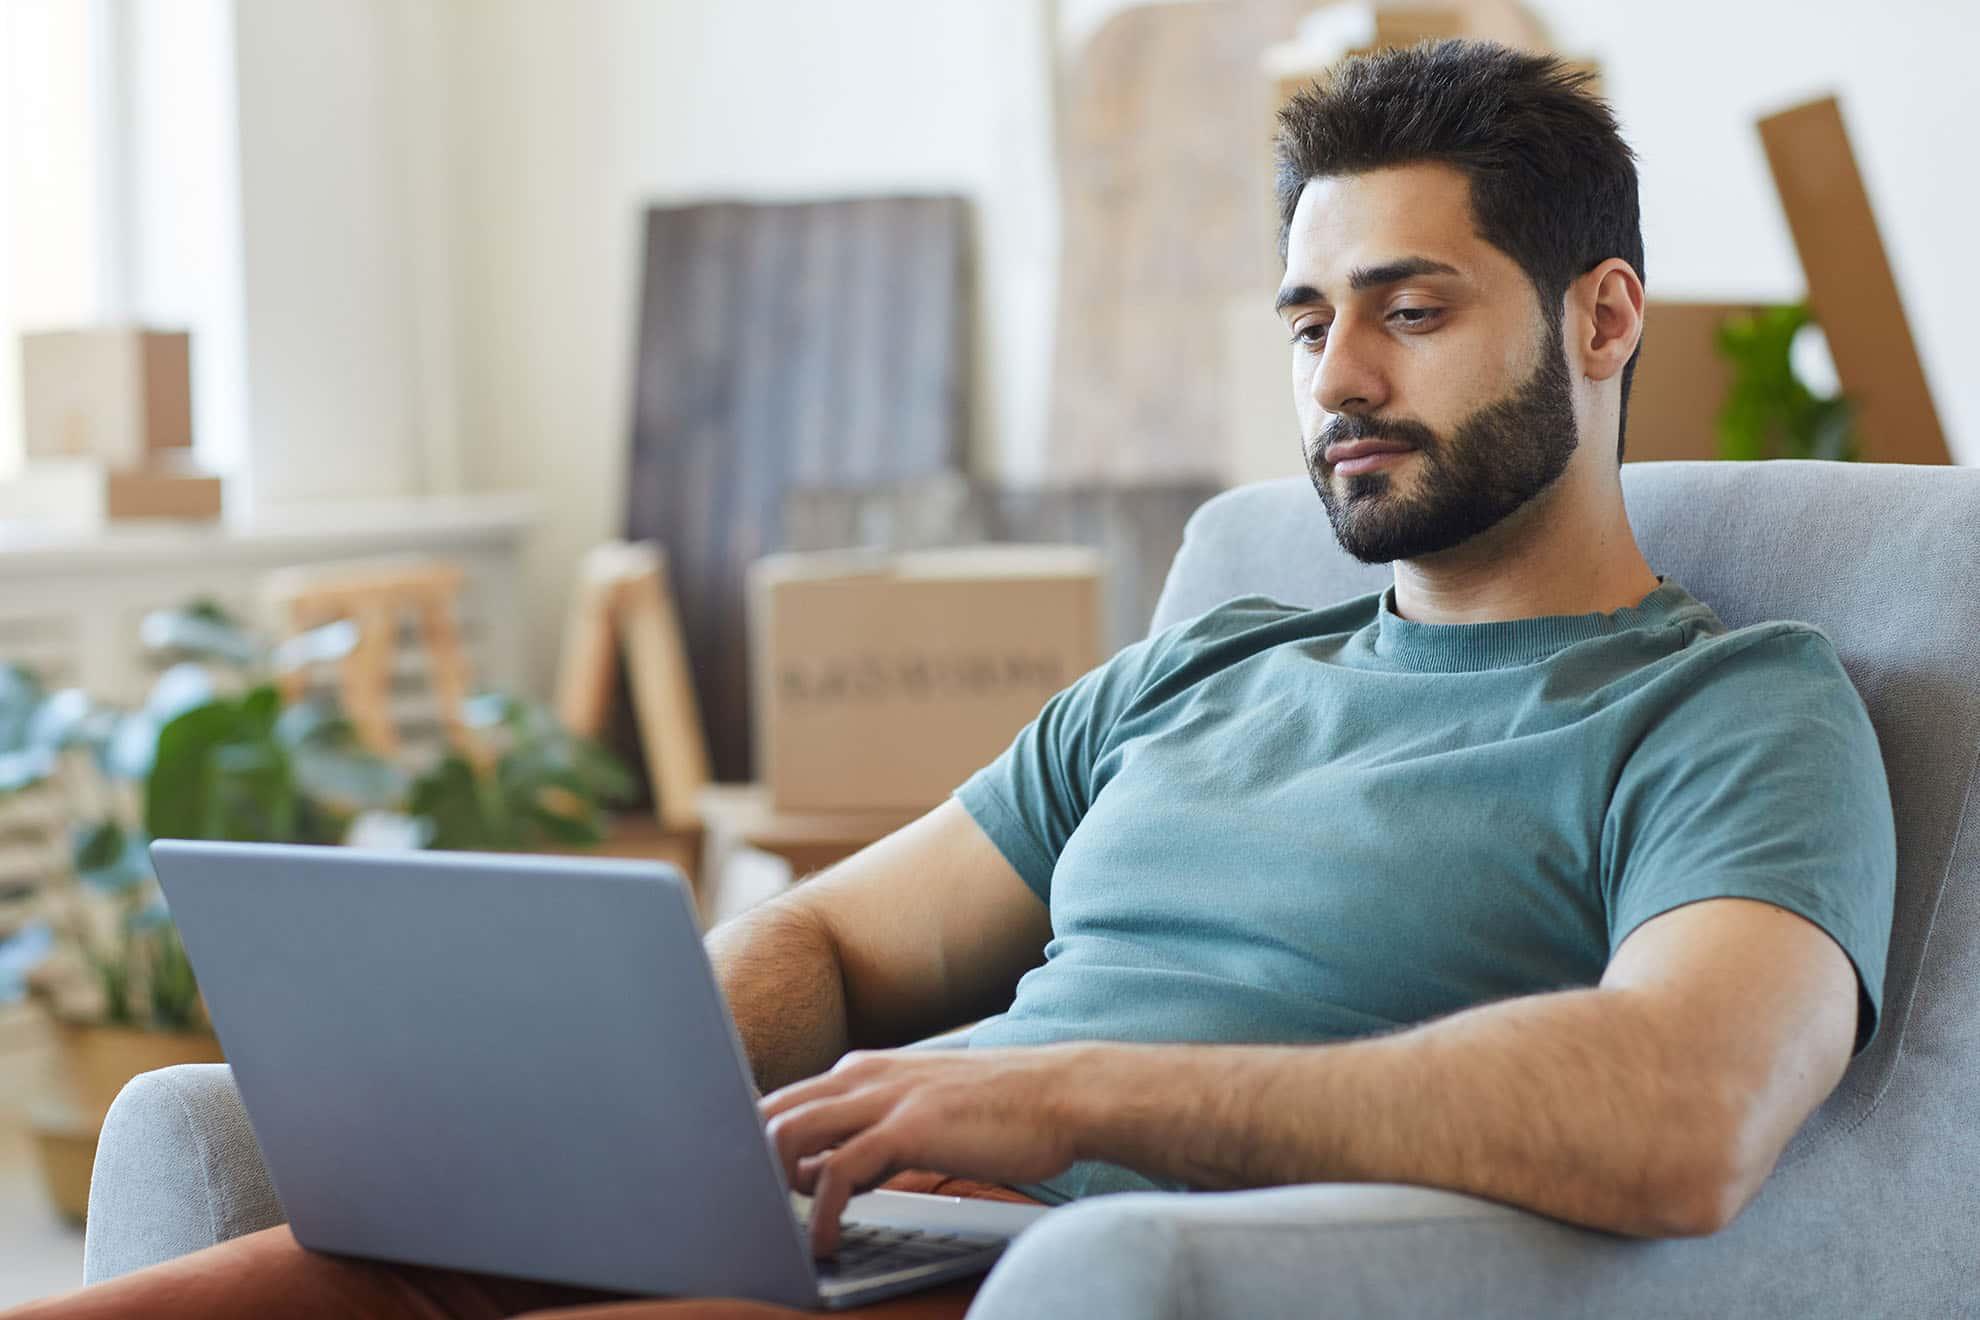 man-with-laptop-at-home-4XRXNPL-min